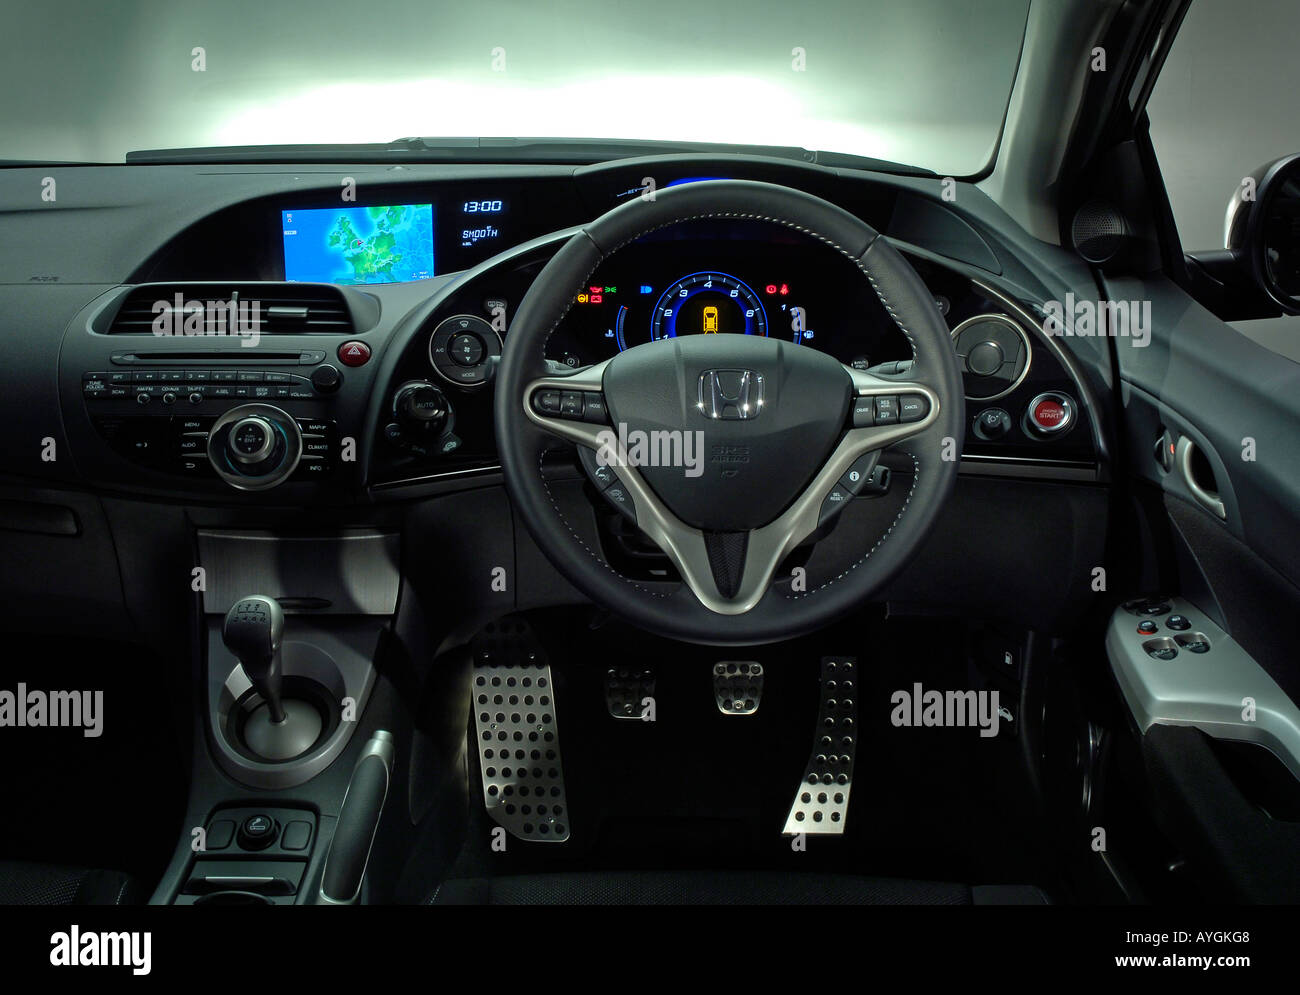 Honda Civic Type R Interior Stockfotos & Honda Civic Type R Interior ...